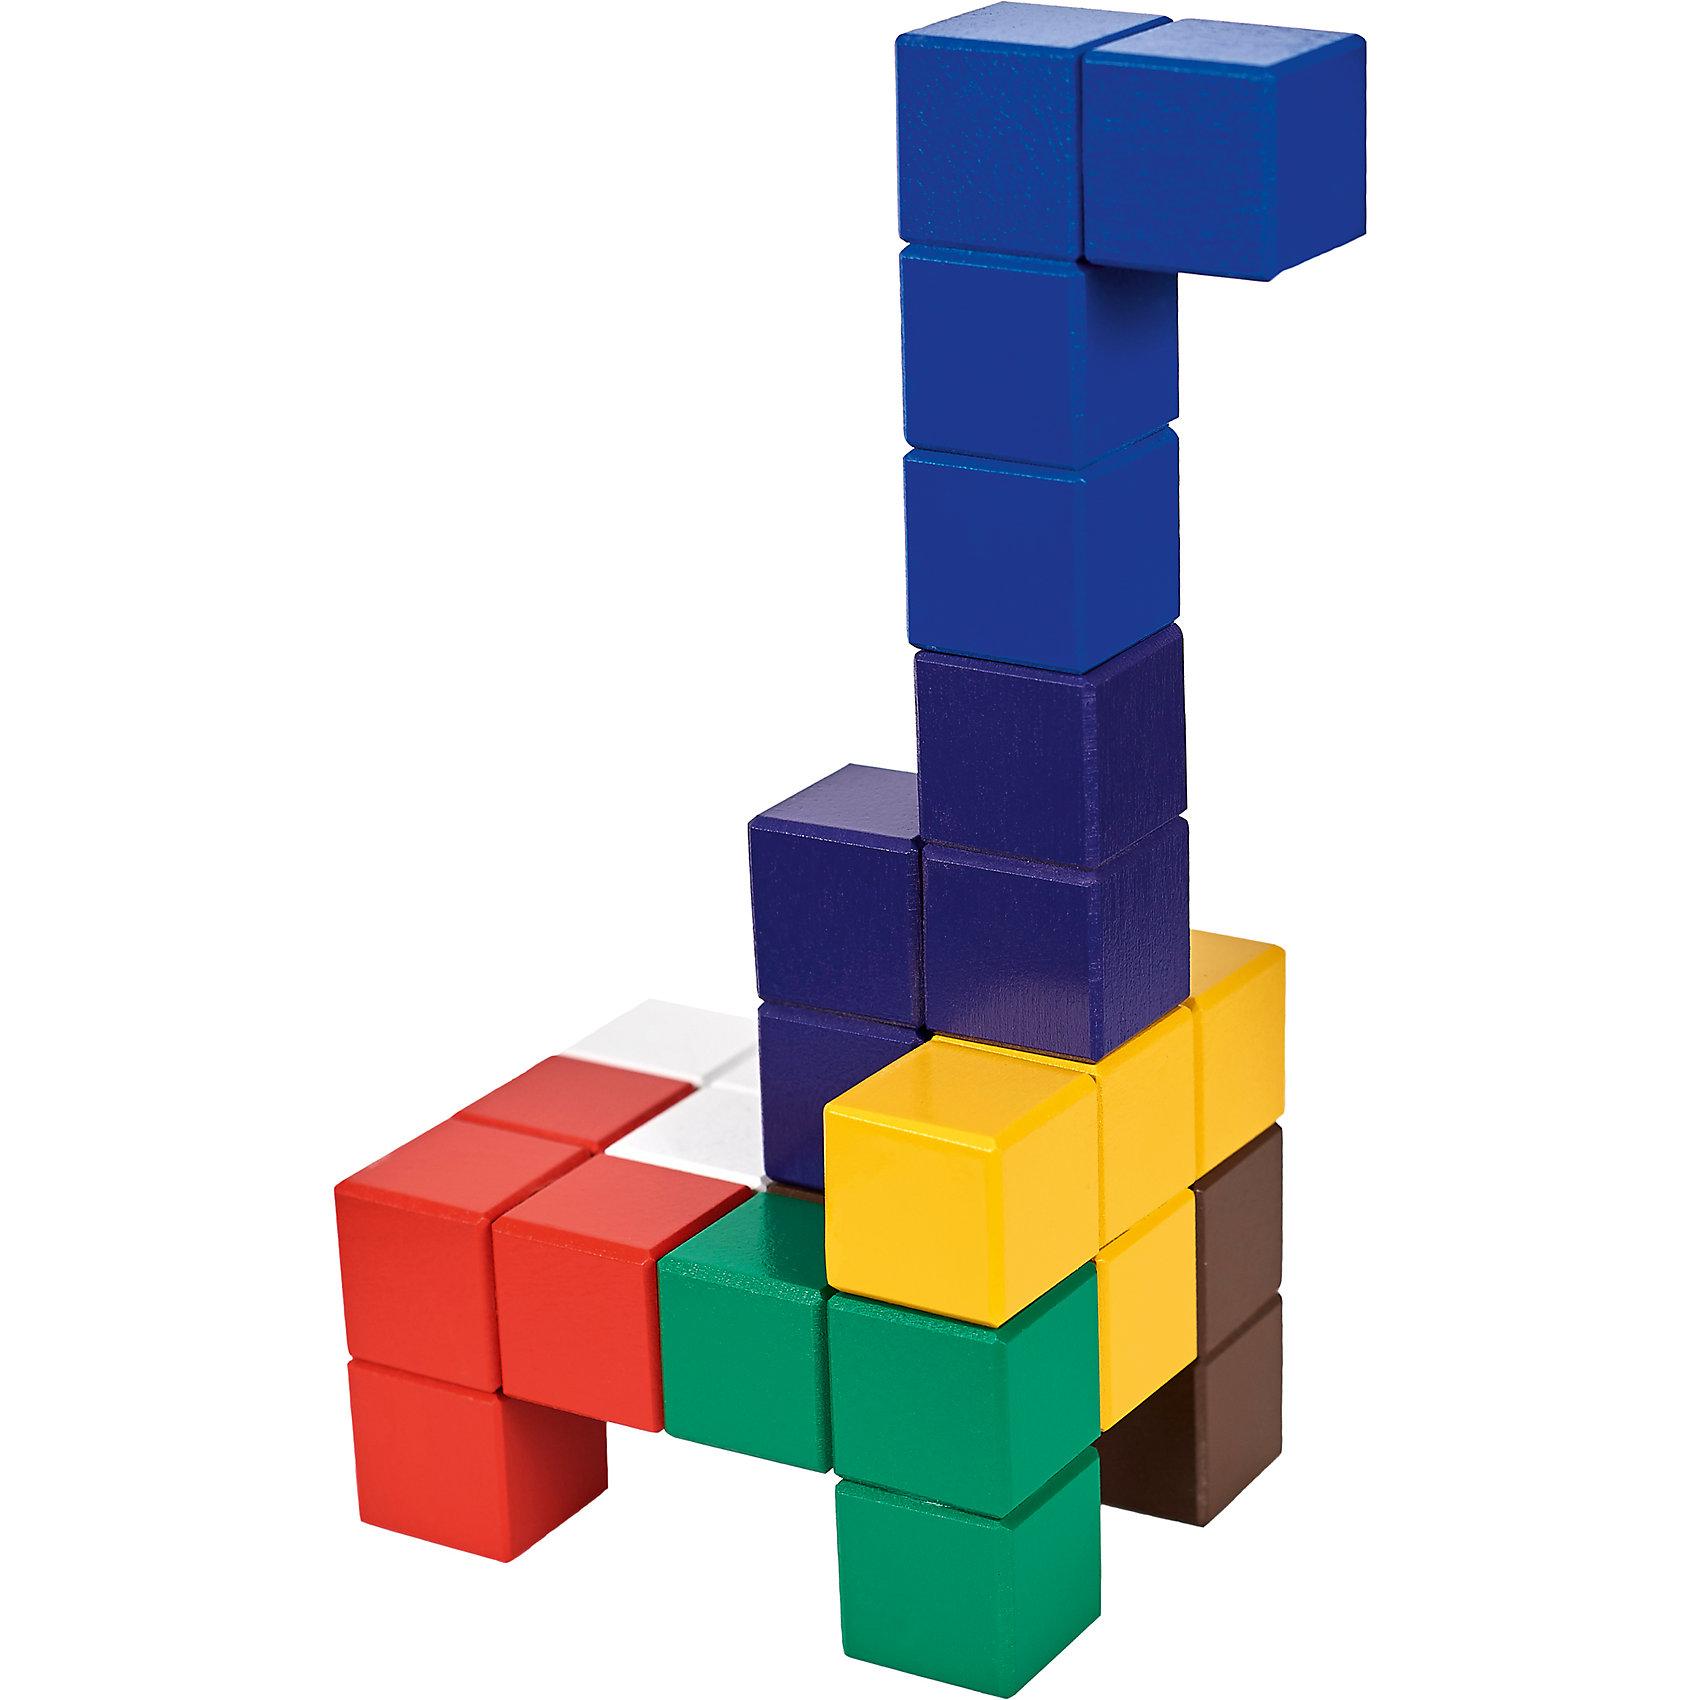 Кубики для всех, (коробка фанера), Световид от myToys